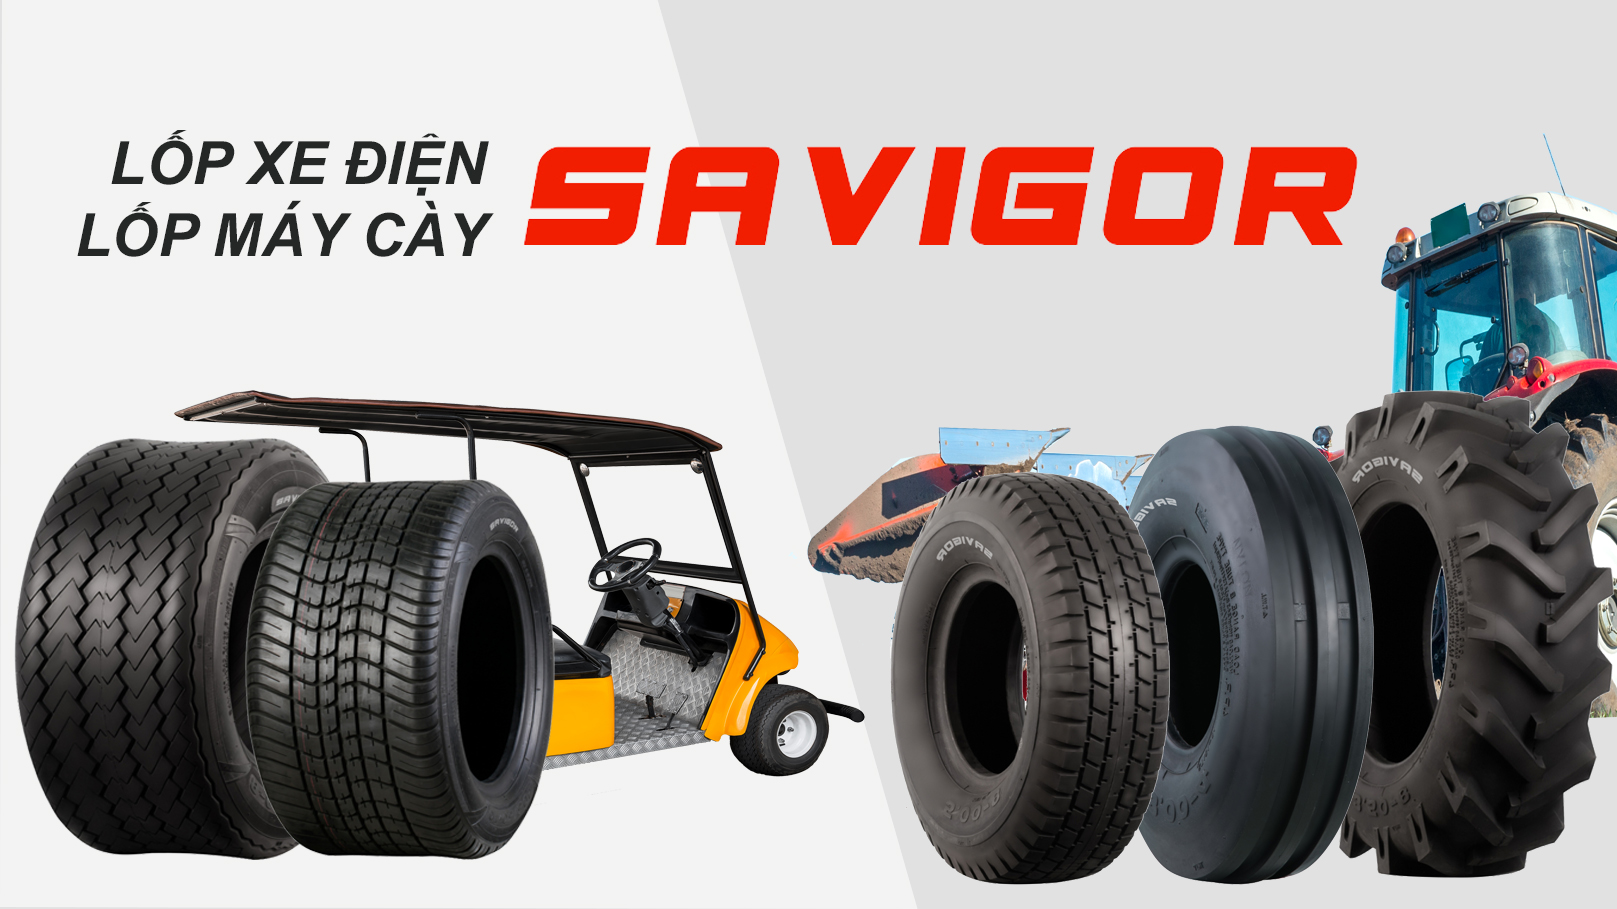 SAVIGOR-VI-SAN-PHAM-lop-xe-dien-lop-xe-golf-lop-may-cay-lop-